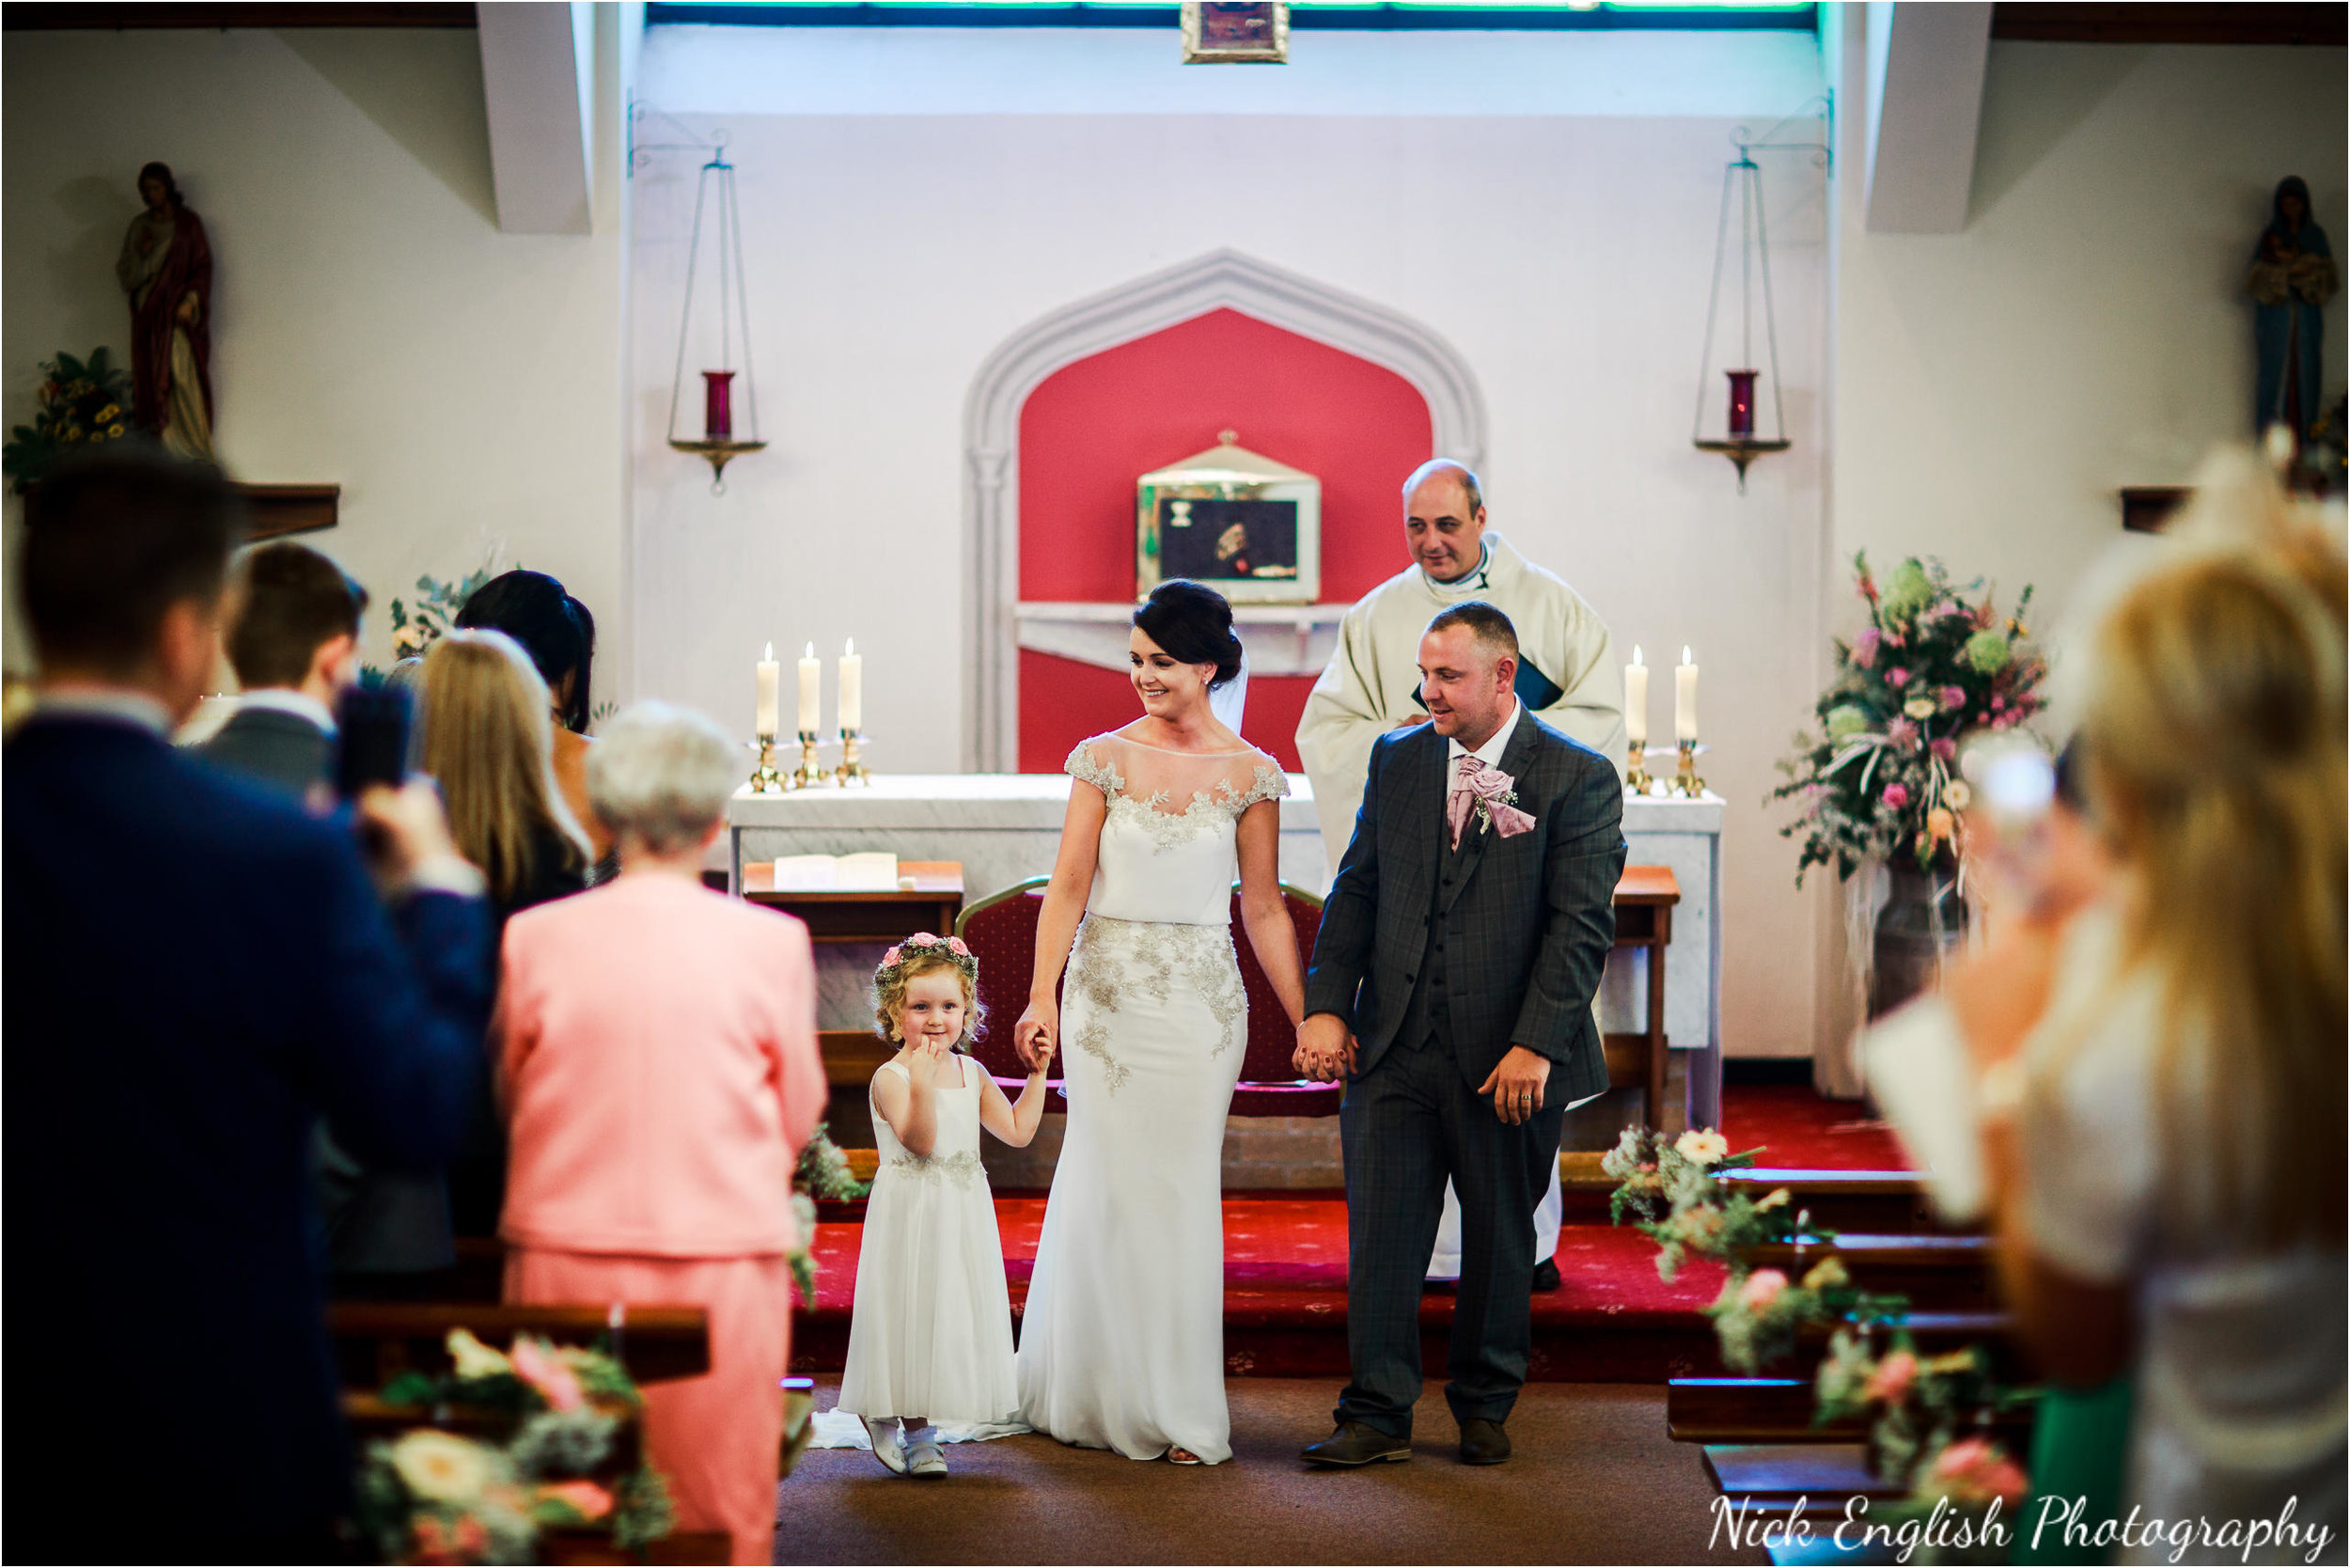 Stacey-Ash-Wedding-Photographs-Stanley-House-Preston-Lancashire-79.jpg